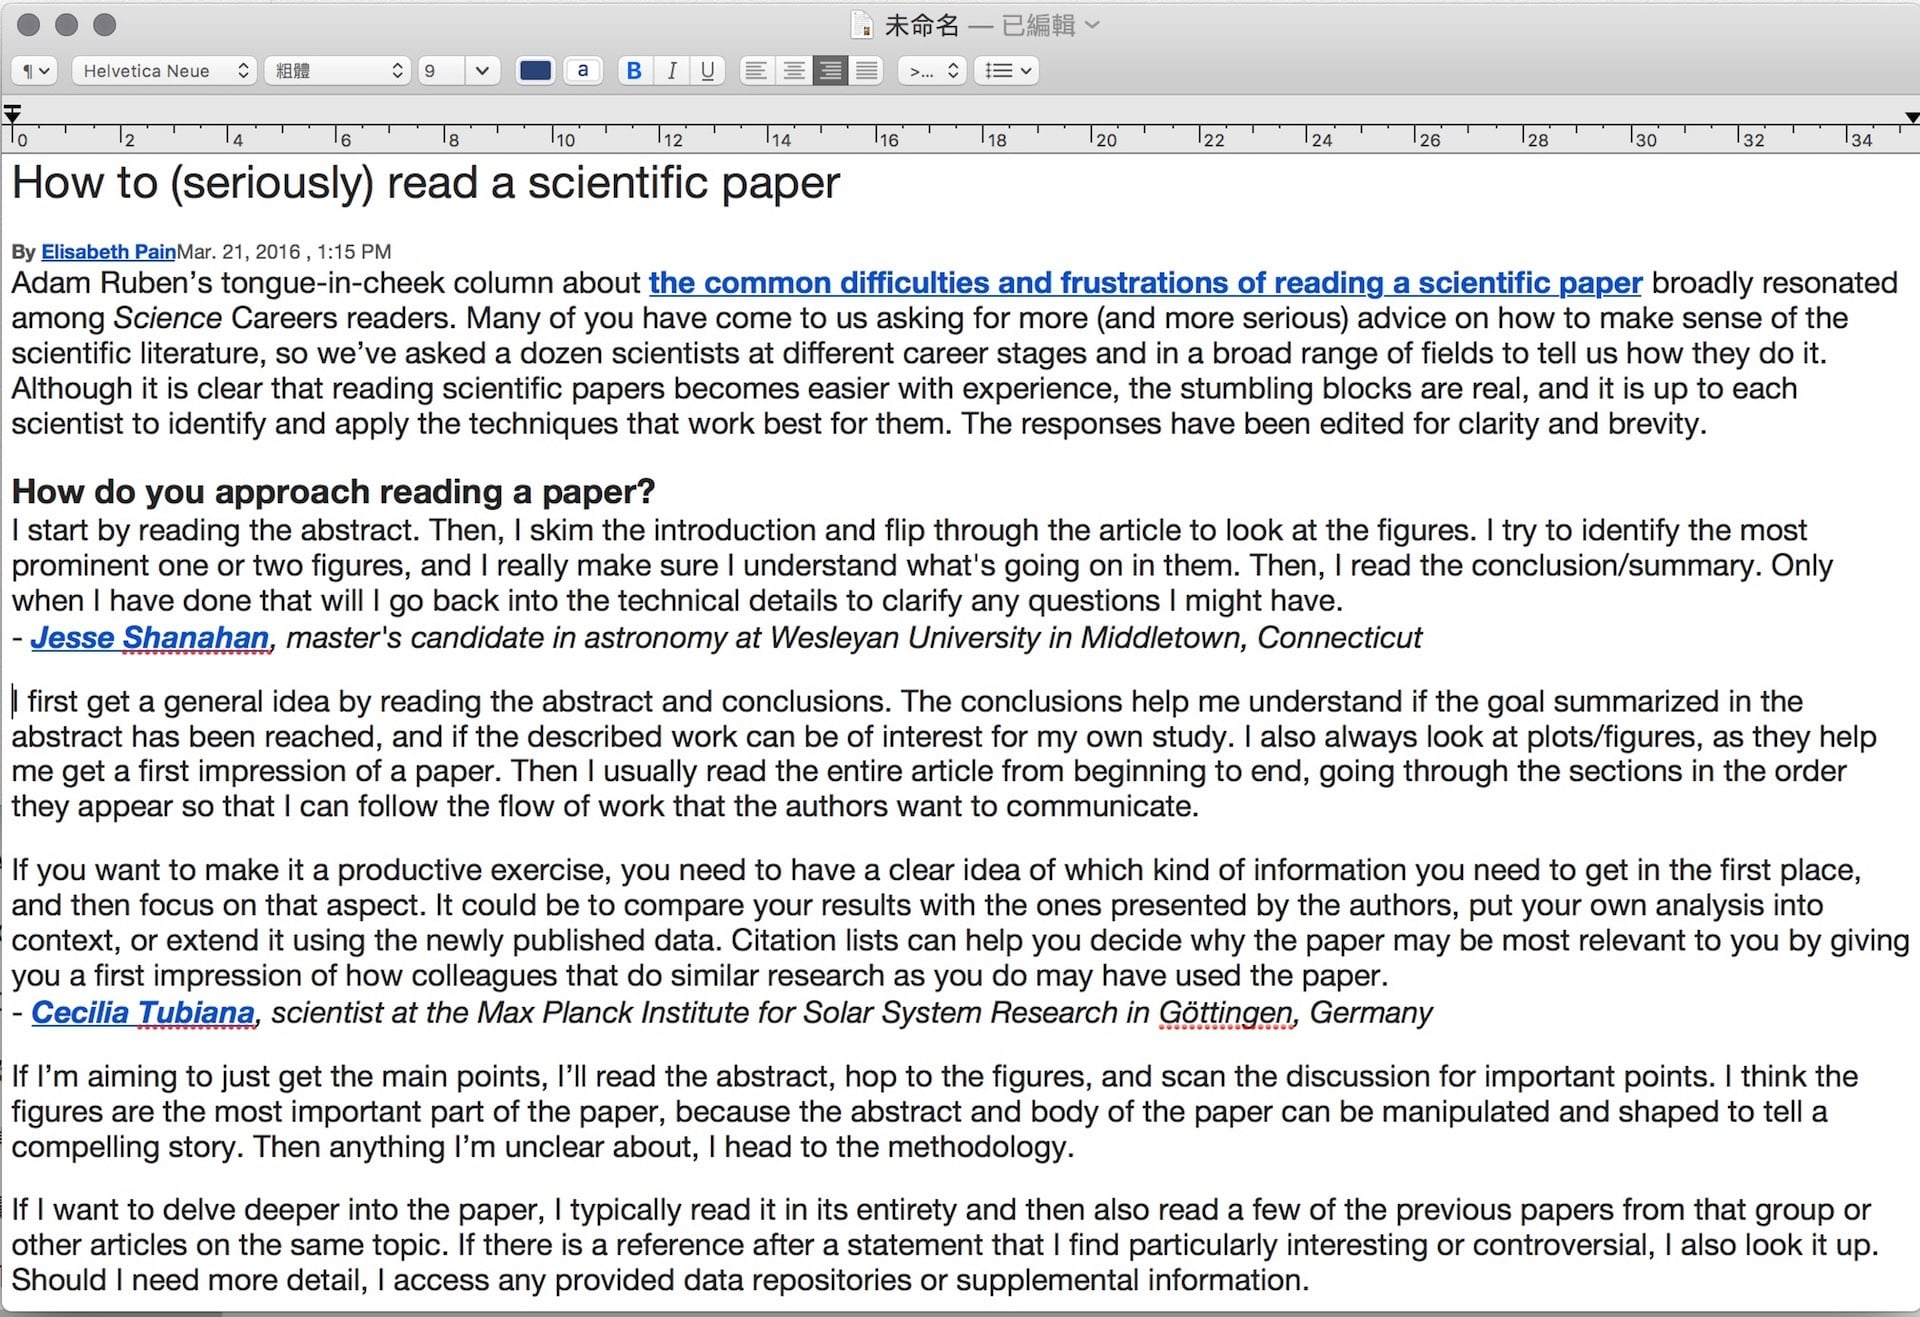 Apple Macbook OSX Text Editor Interface 201803 將喜歡的文章「寄」給亞馬遜 Amazon Kindle 電子閱讀器的使用教學